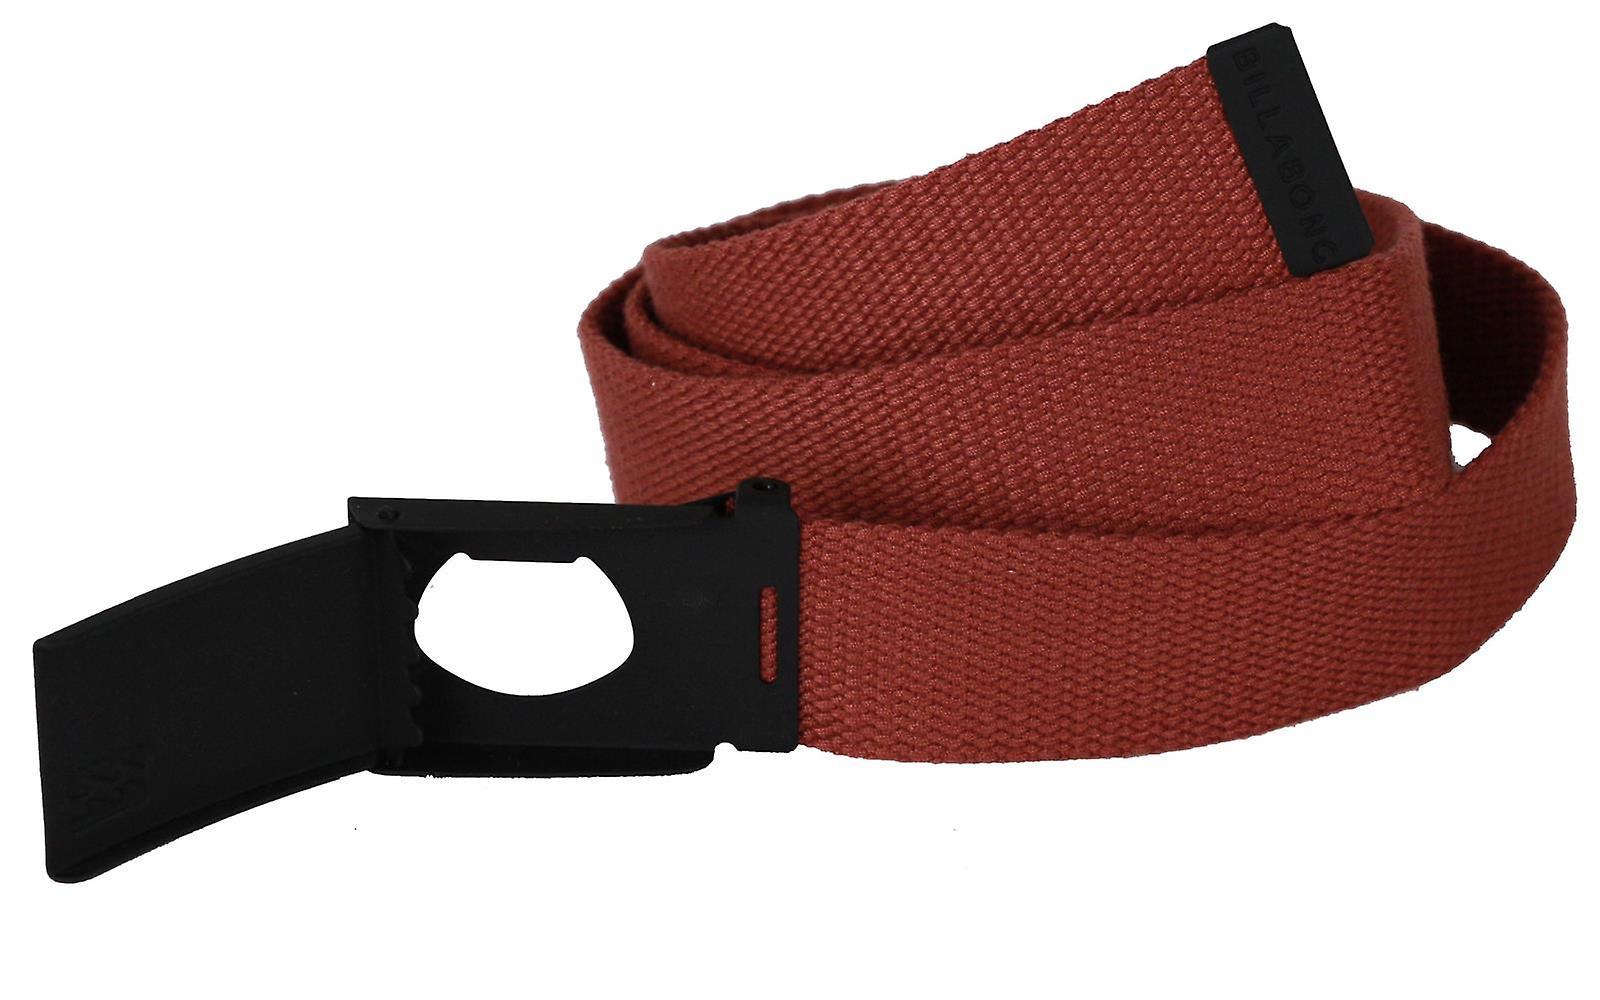 Billabong Woven Cotton Web Belt With Bottle Opener ~ Cog sangria